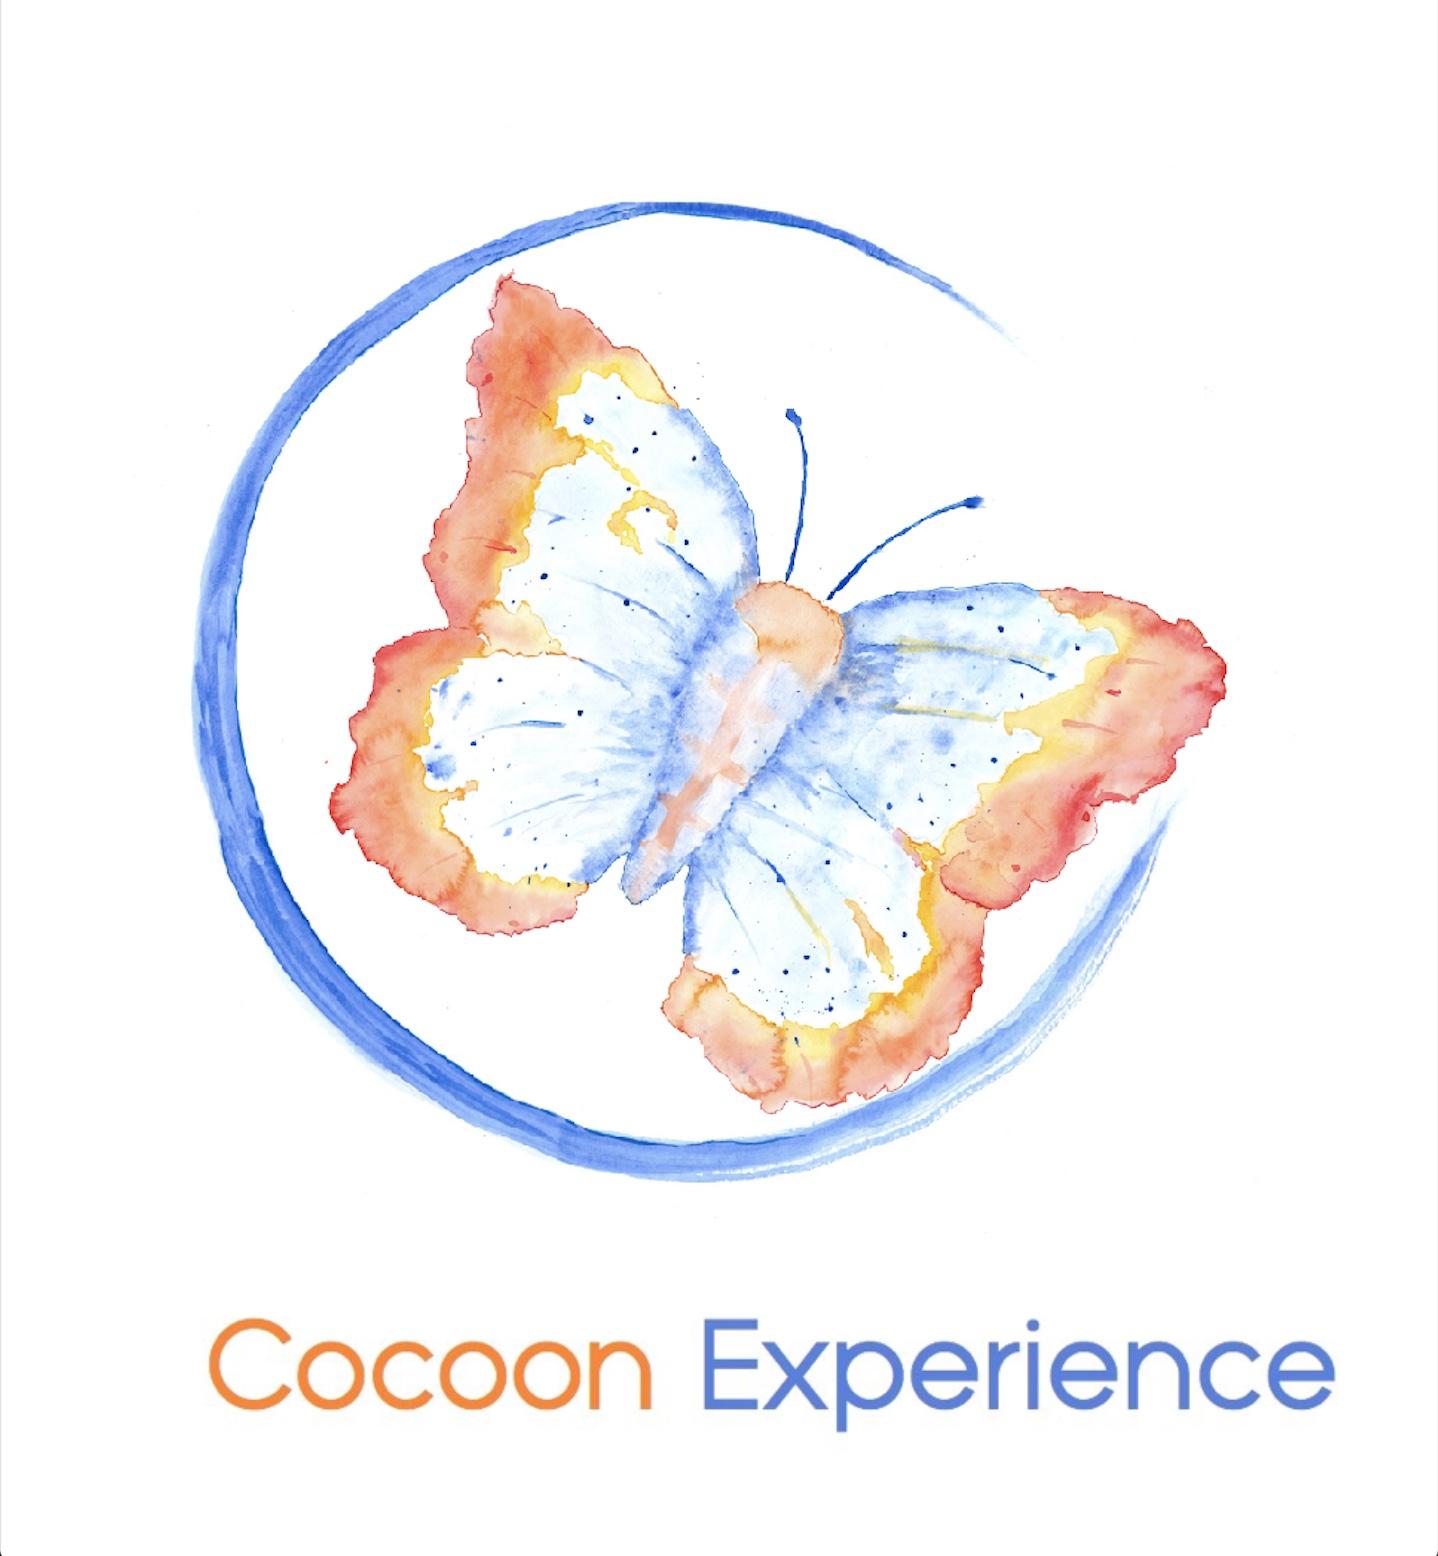 Cocoon Experience - logo.jpeg